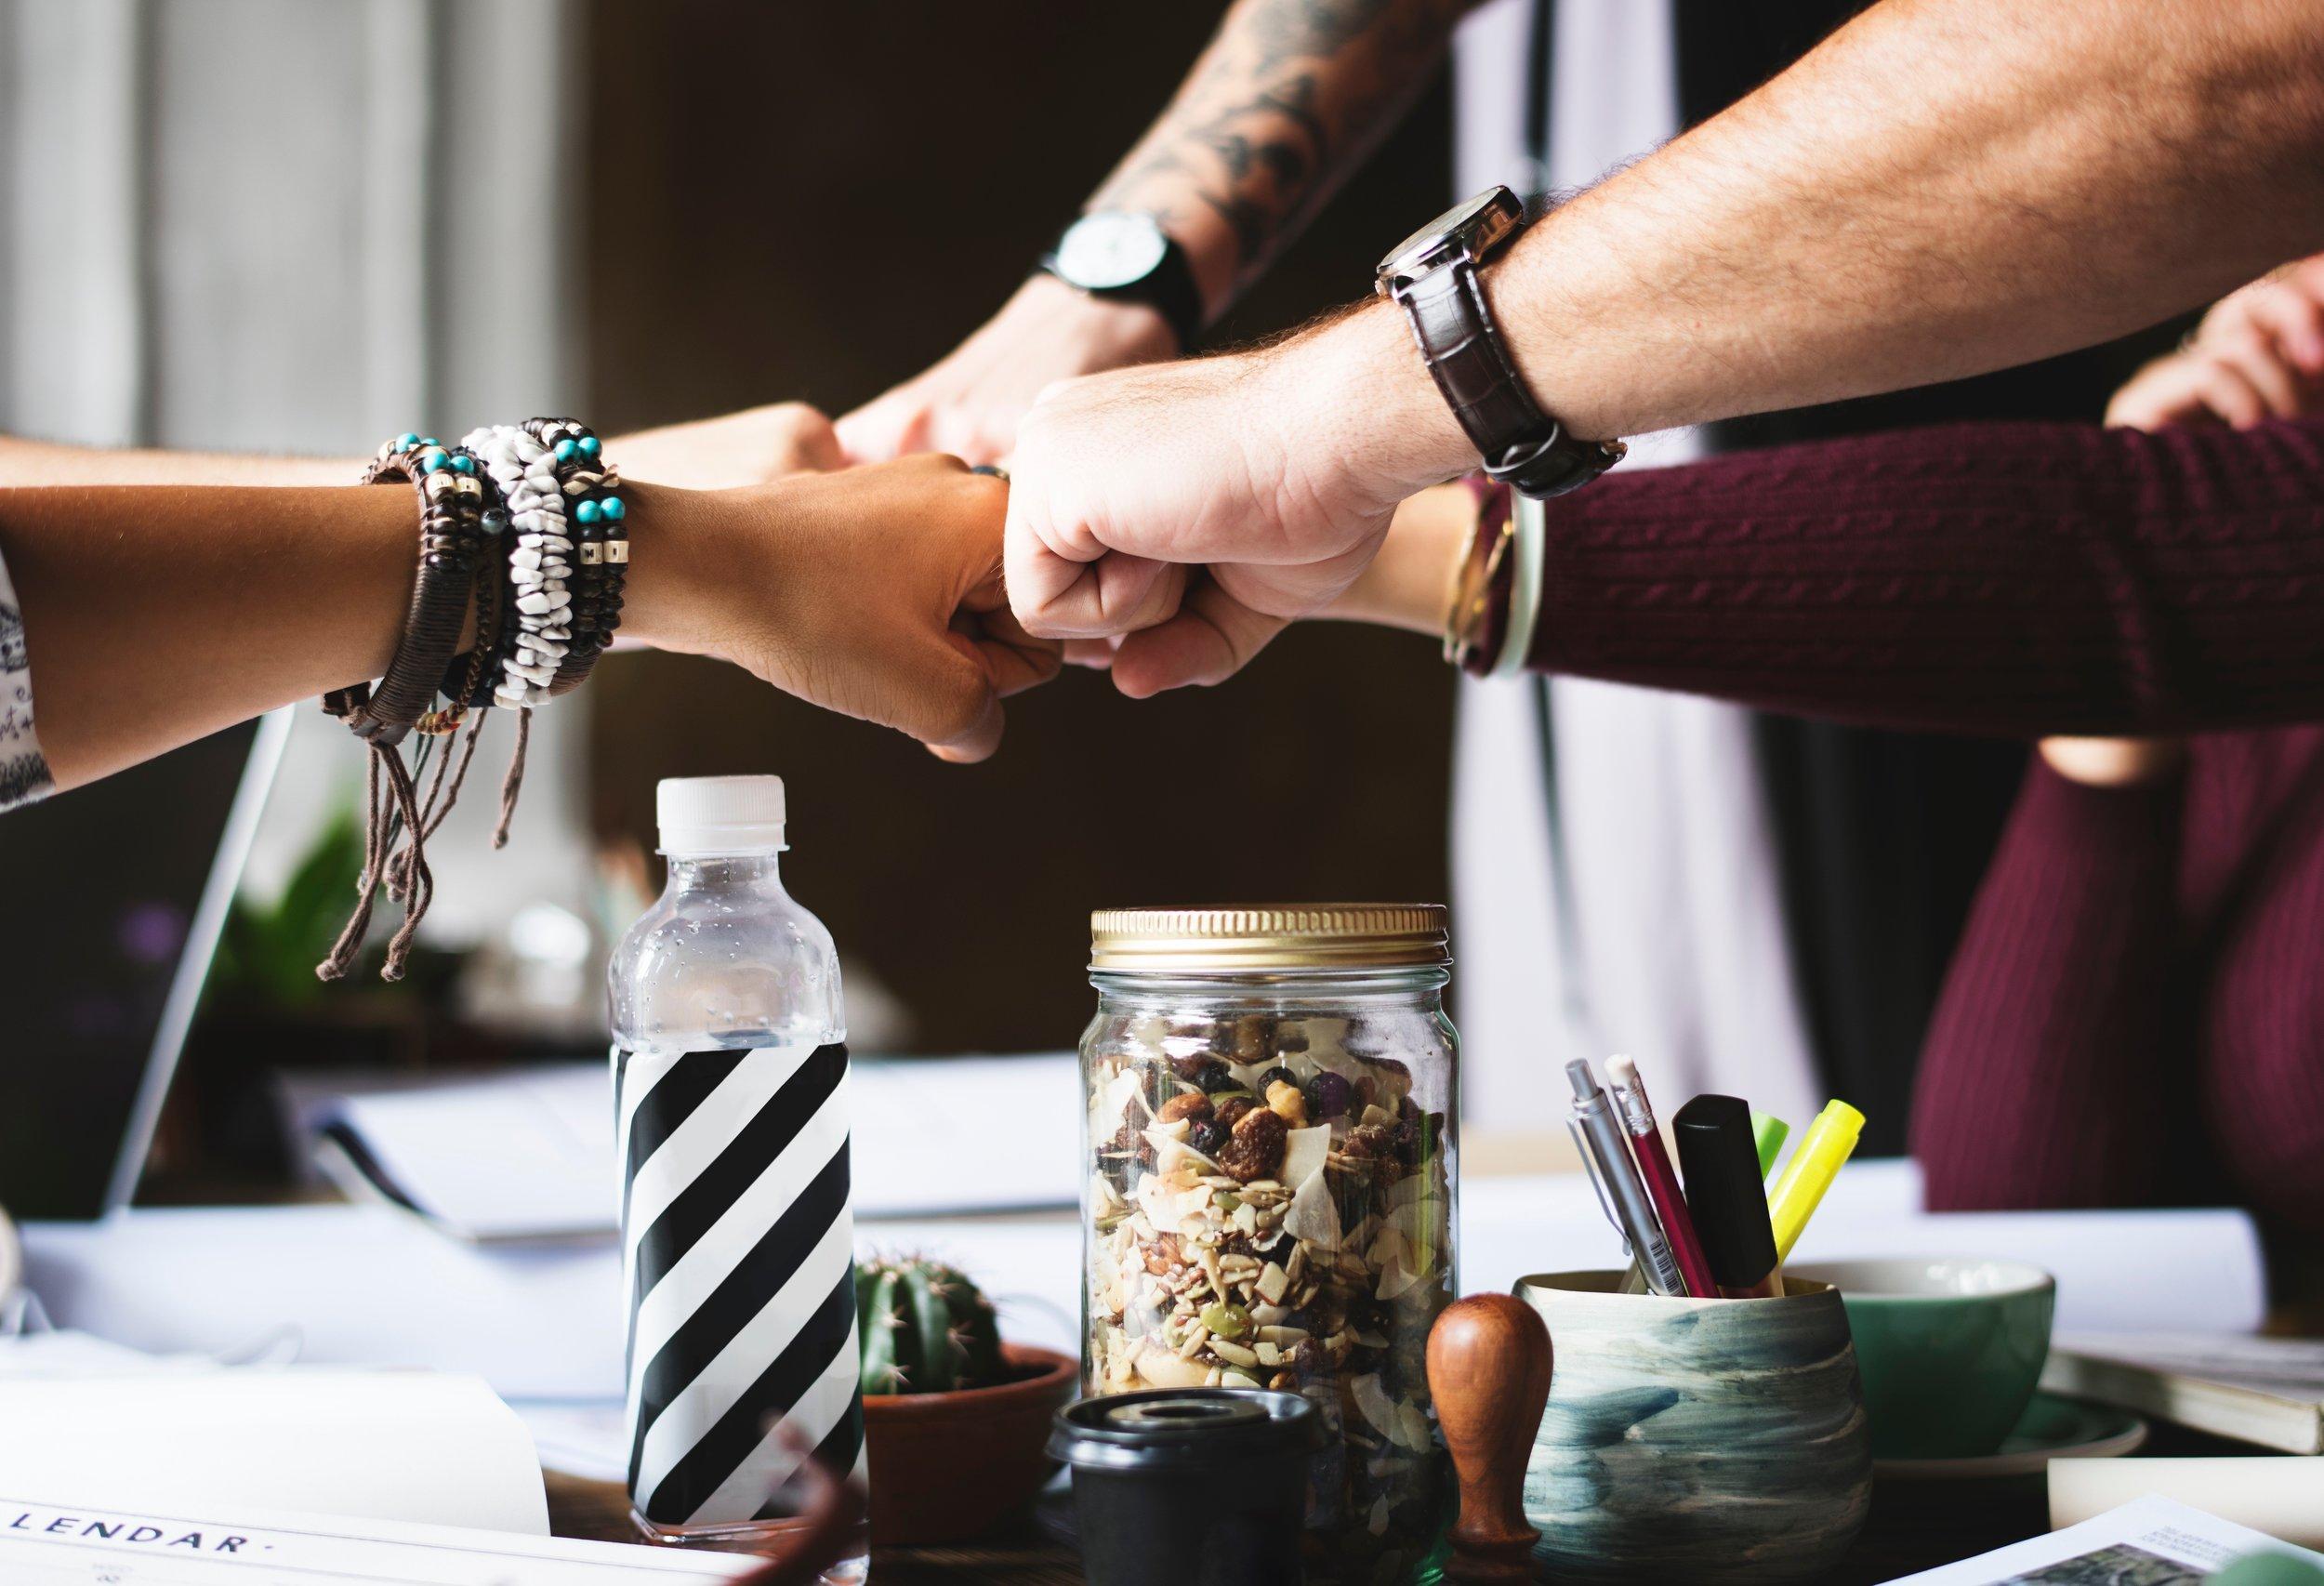 mentoring-post-title-image.jpg